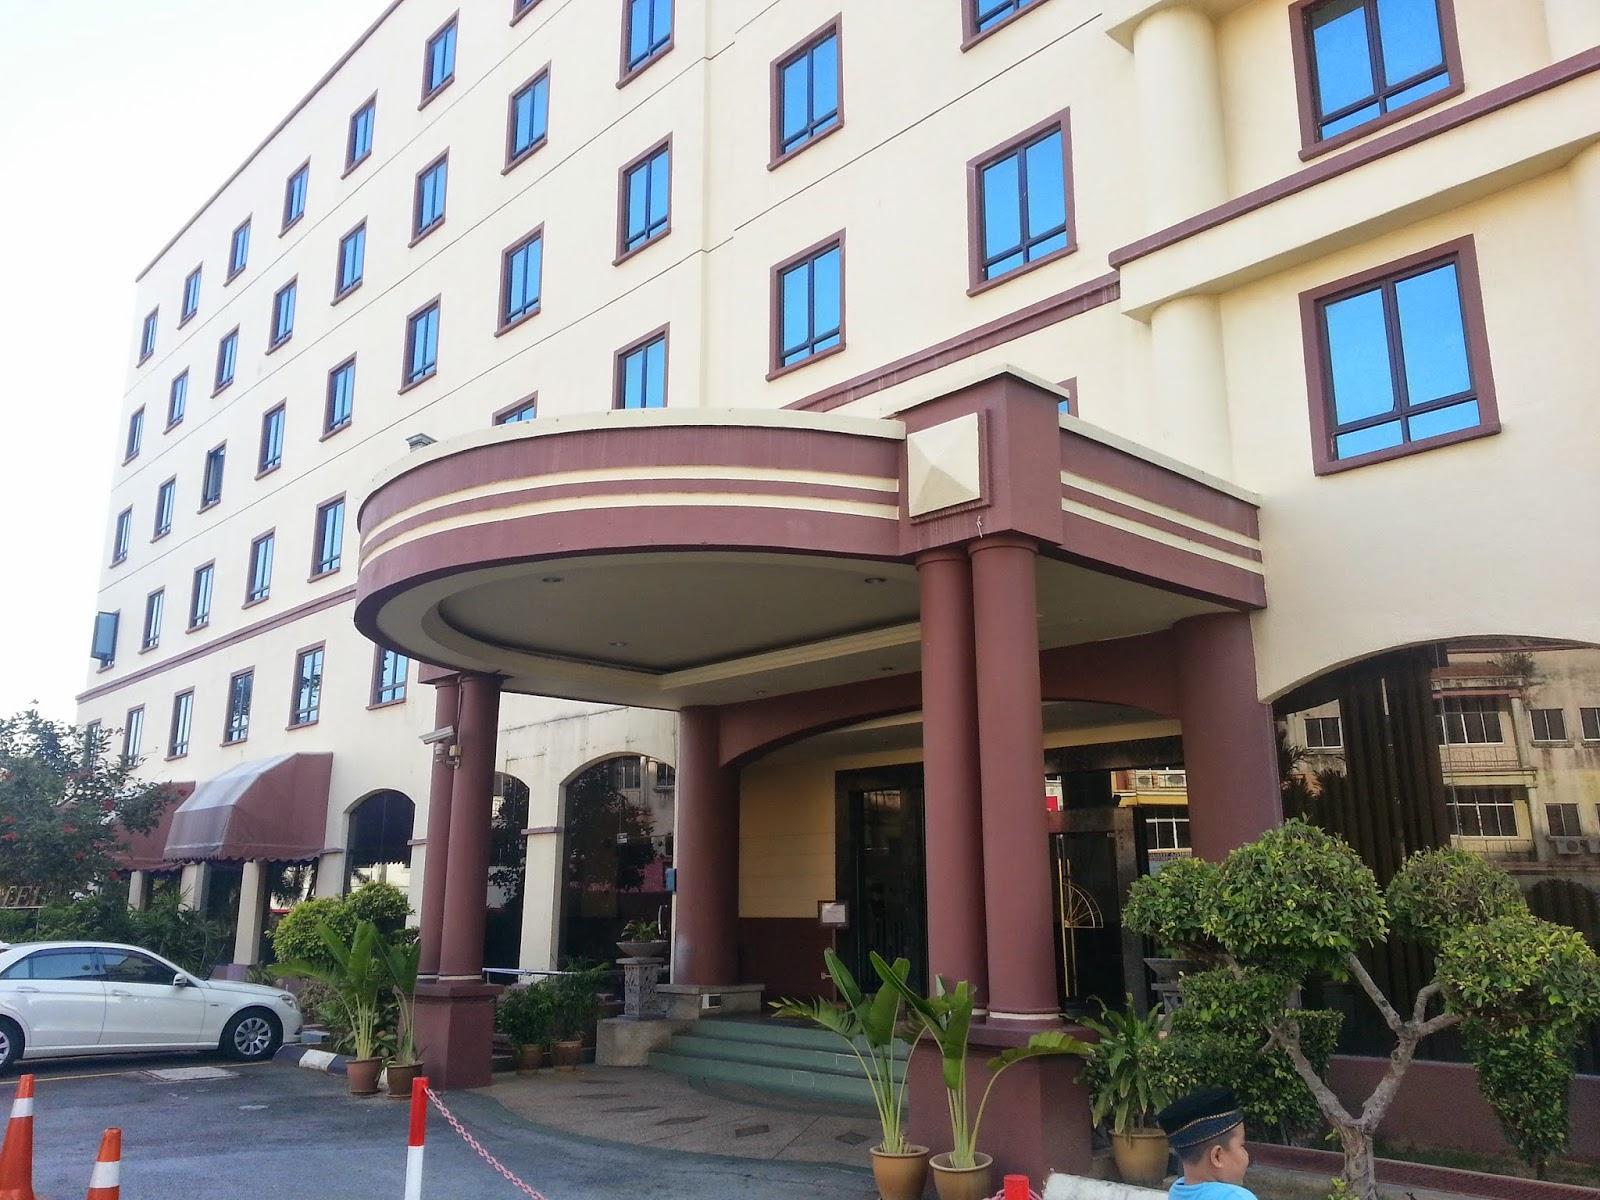 The Aston Hotel